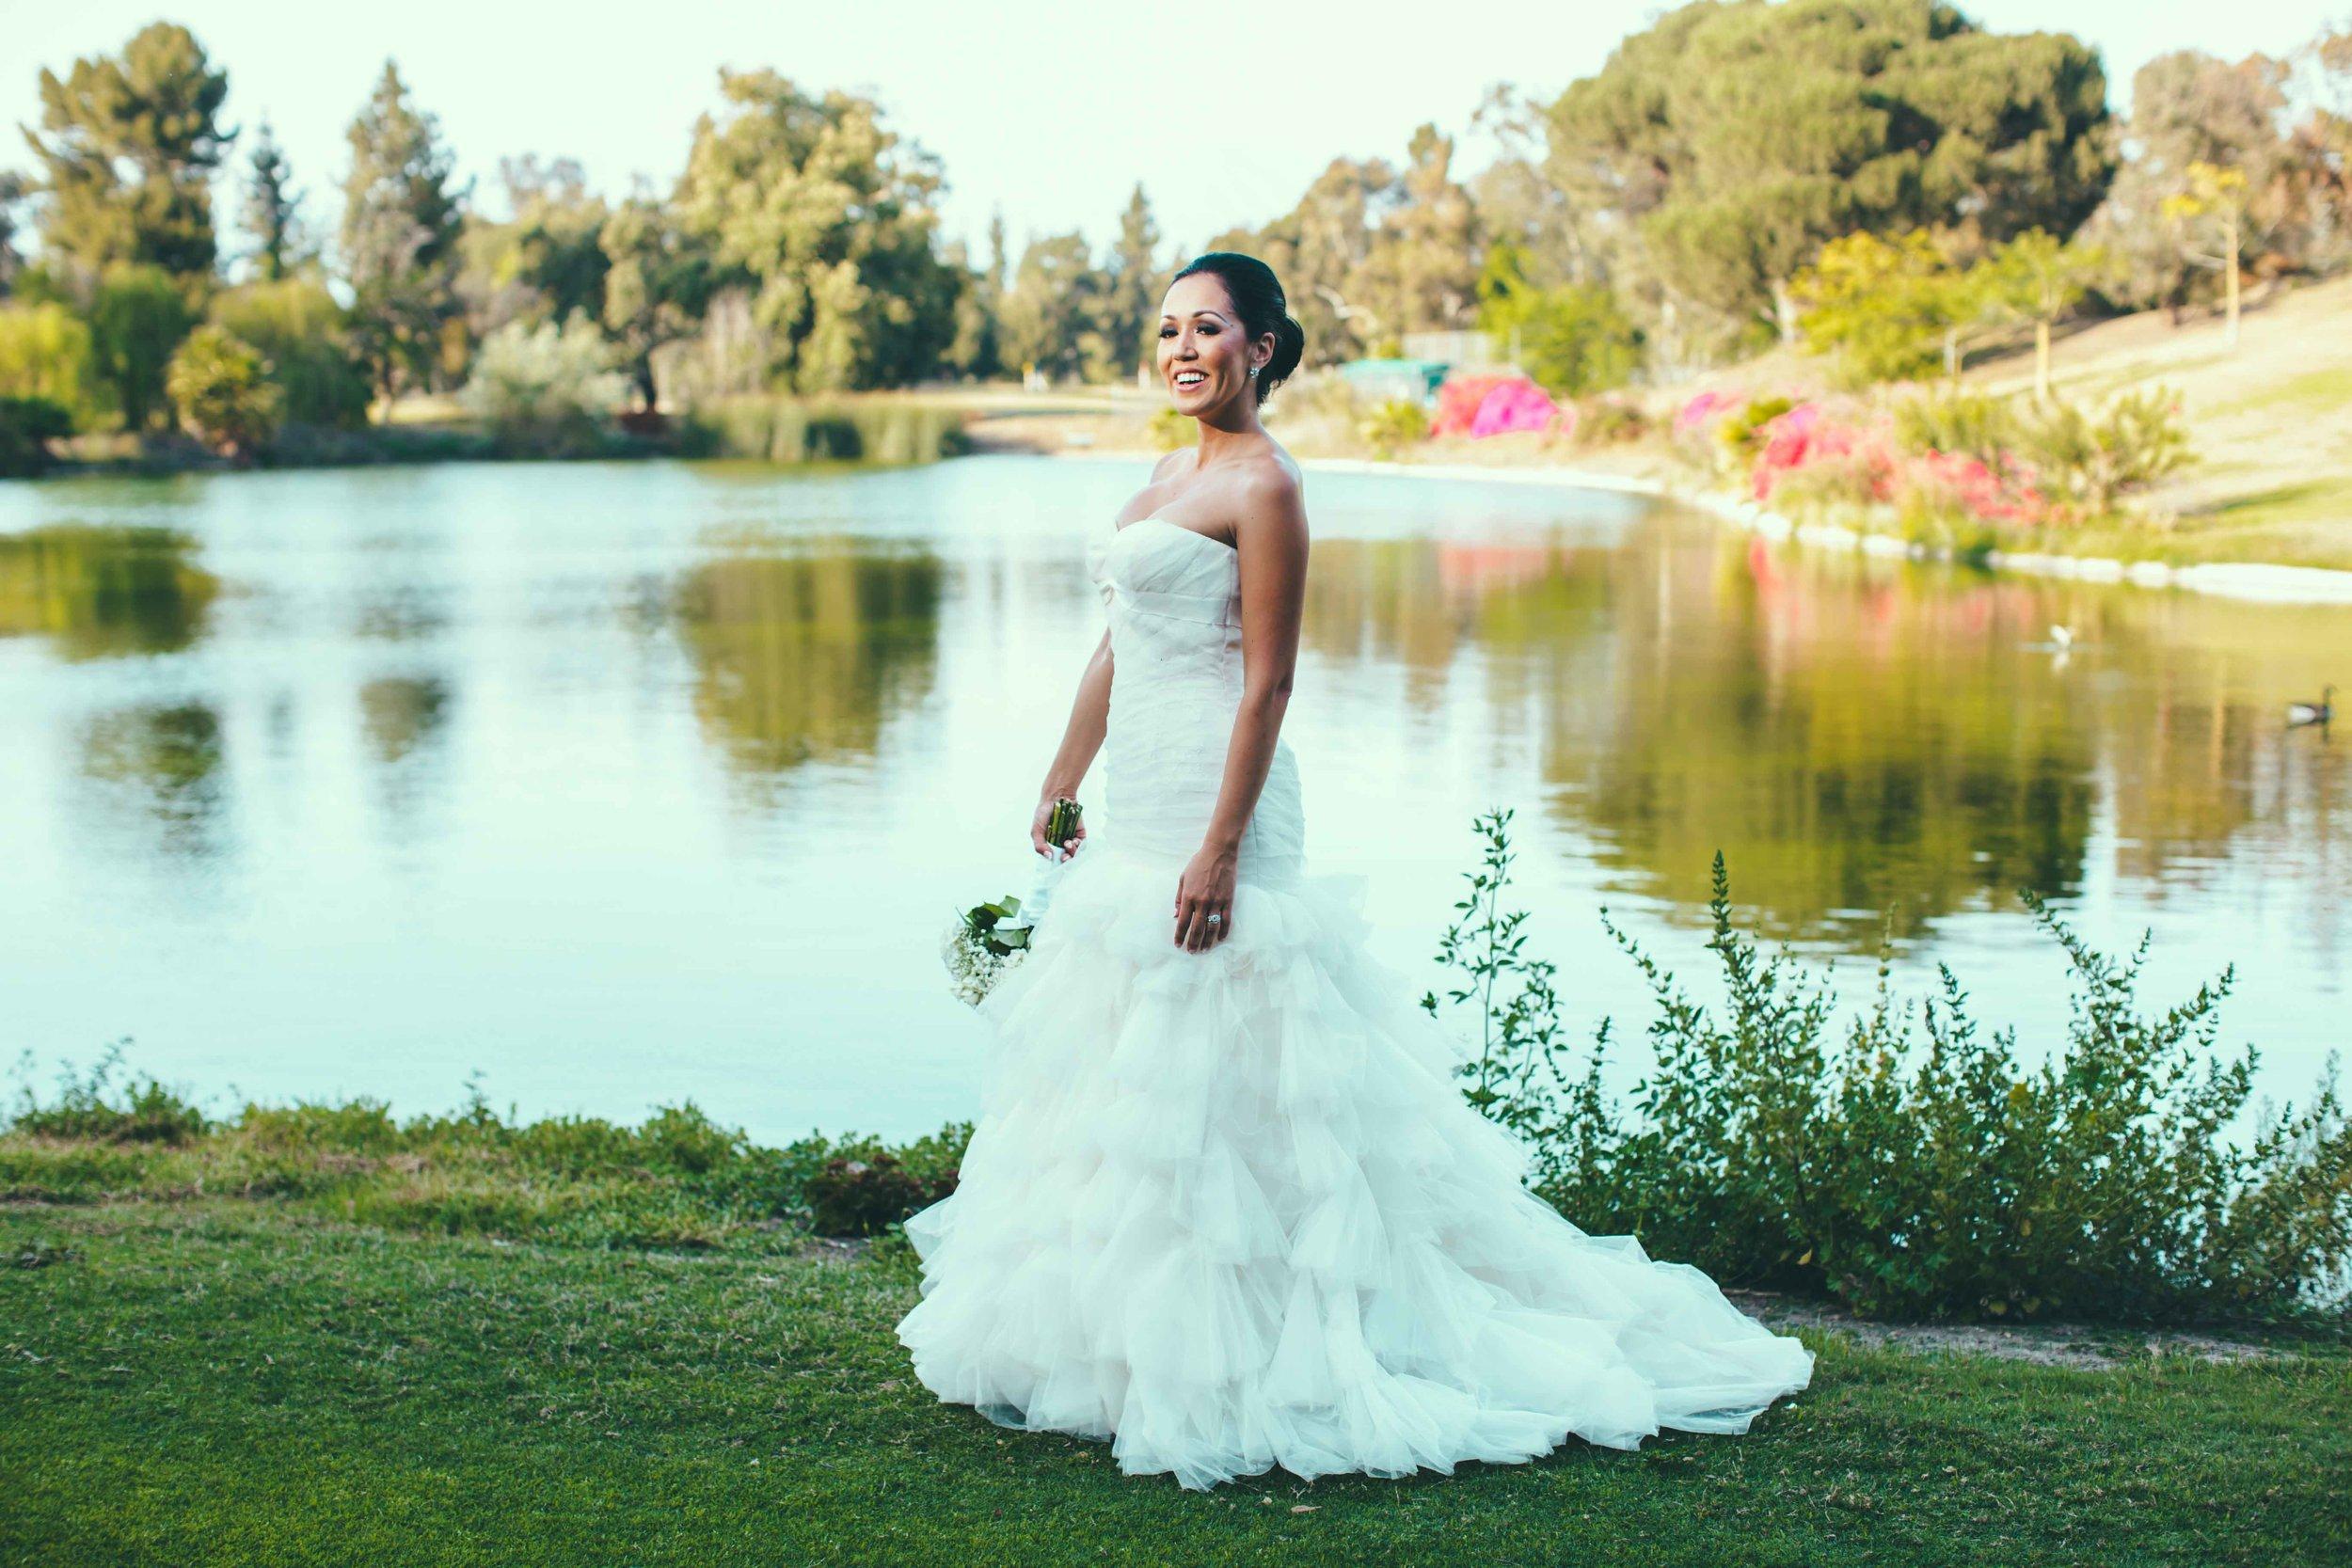 APavone-Photographer-Orange-County-Diamond-Bar-Wedding-067.jpg